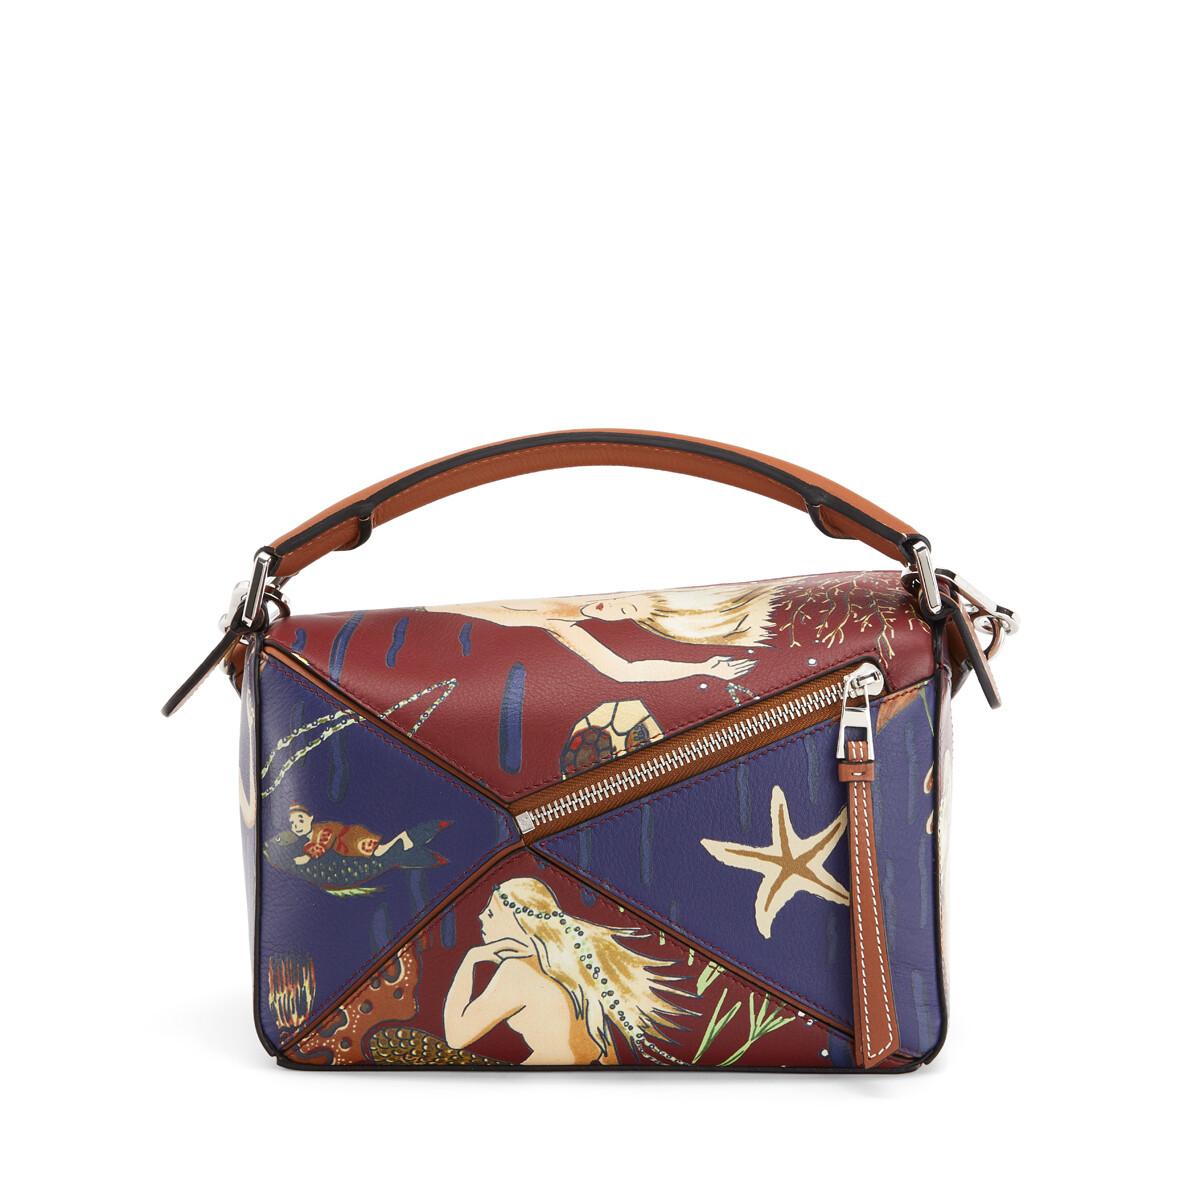 LOEWE Small Puzzle Bag In Mermaid Classic Calfskin Burgundy/Marine front